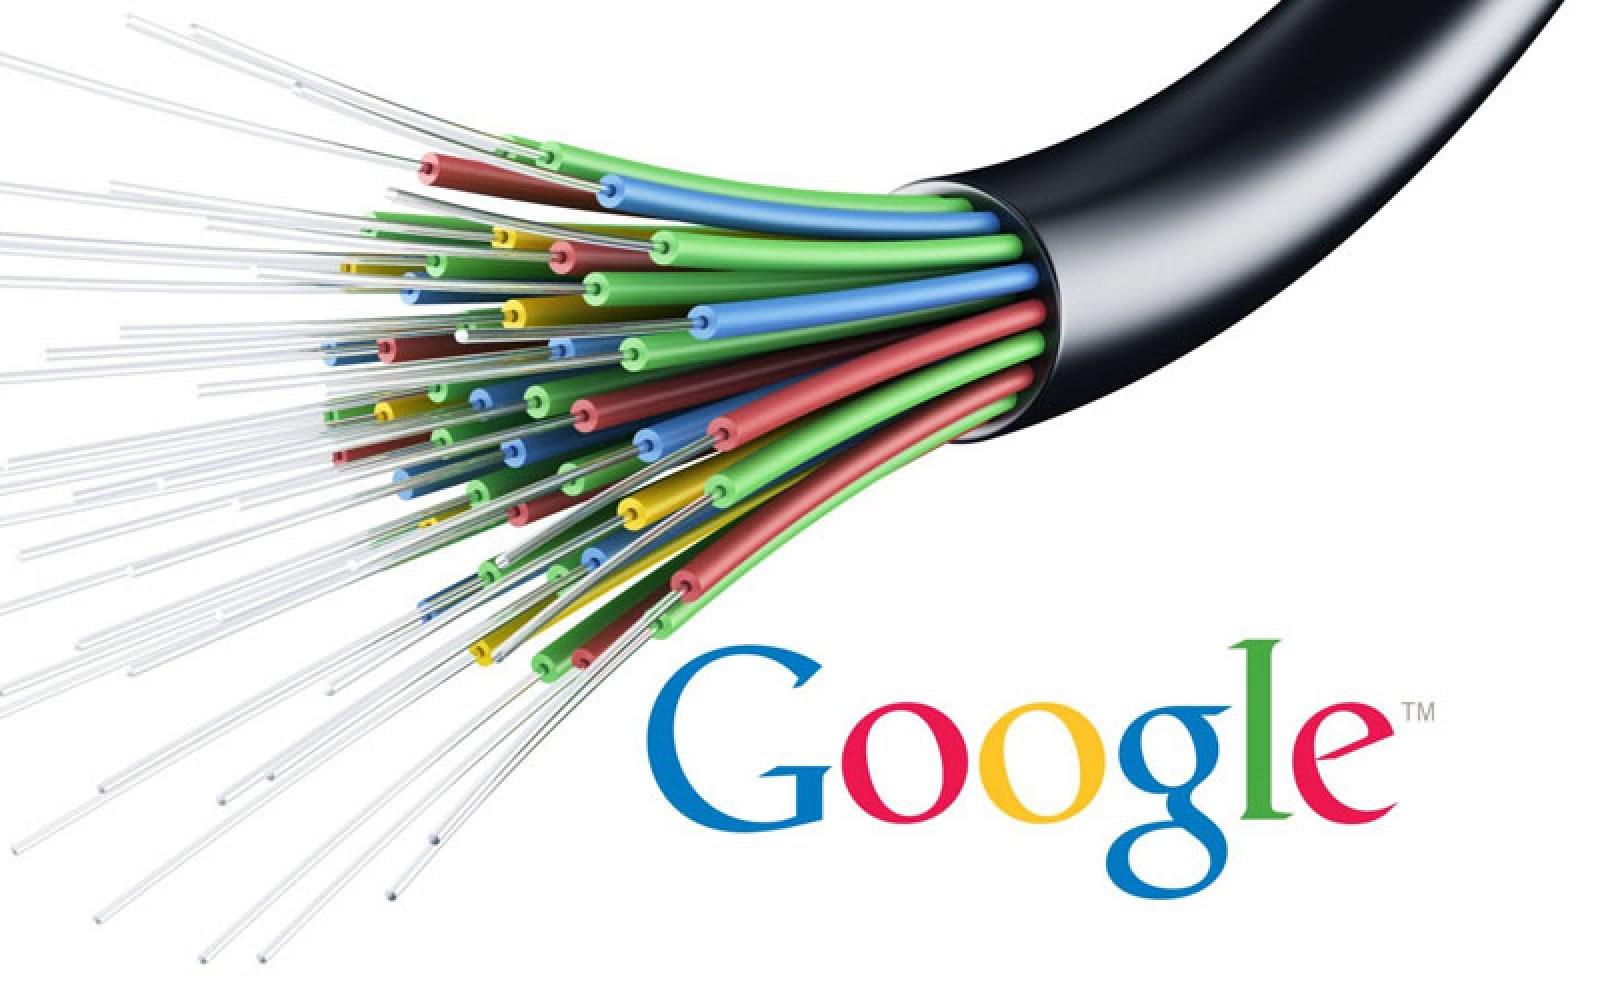 Google Fiber sign-ups well behind expectations, company slashing workforce – report